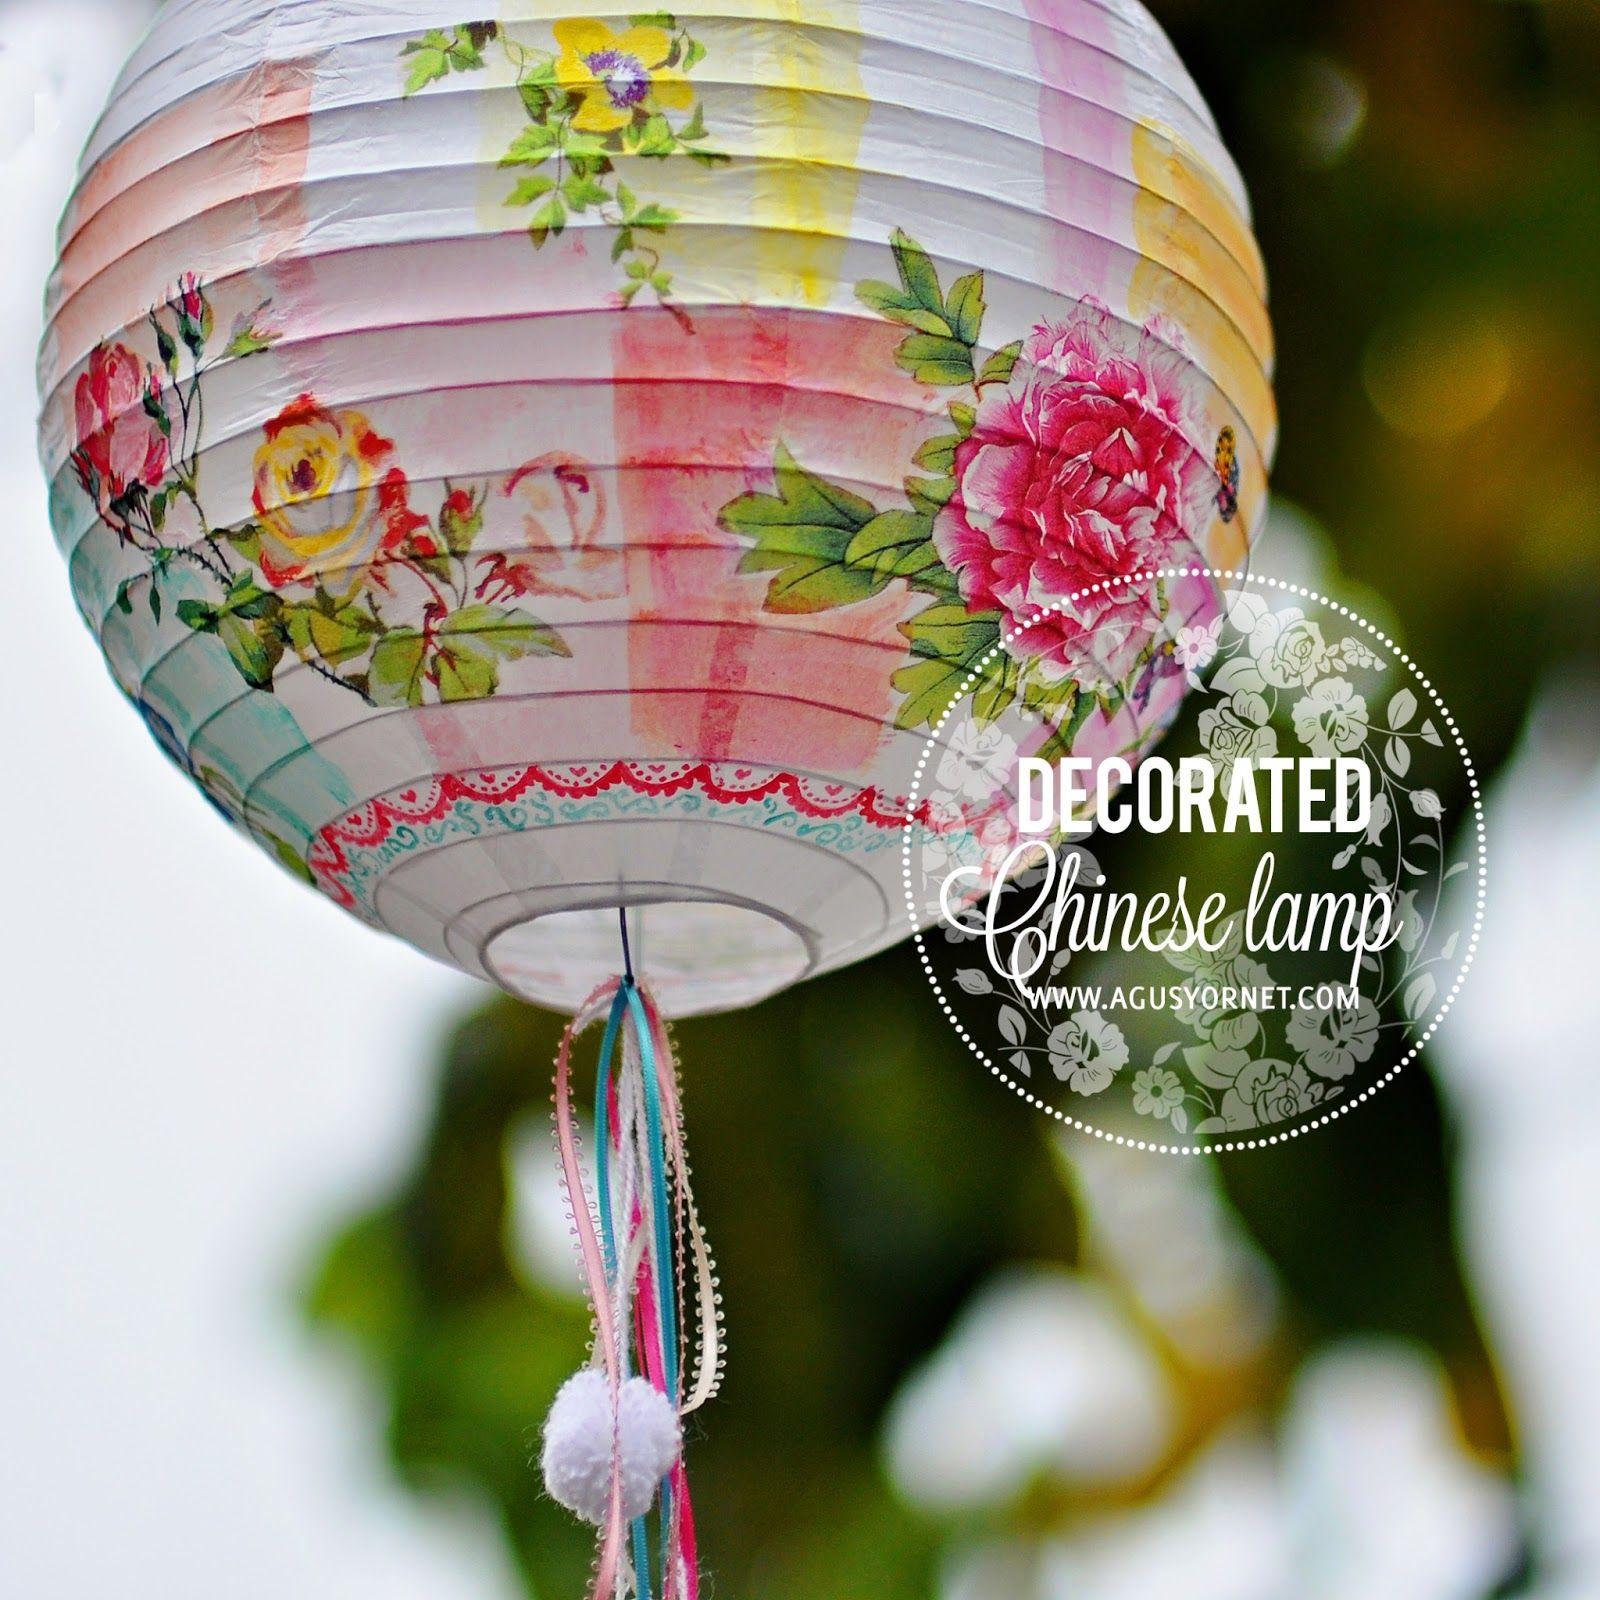 Lampara China Decorada Decorated Chinese Lamp Lamparas Chinas Decoradas Lámparas Chinas Linternas Chinas